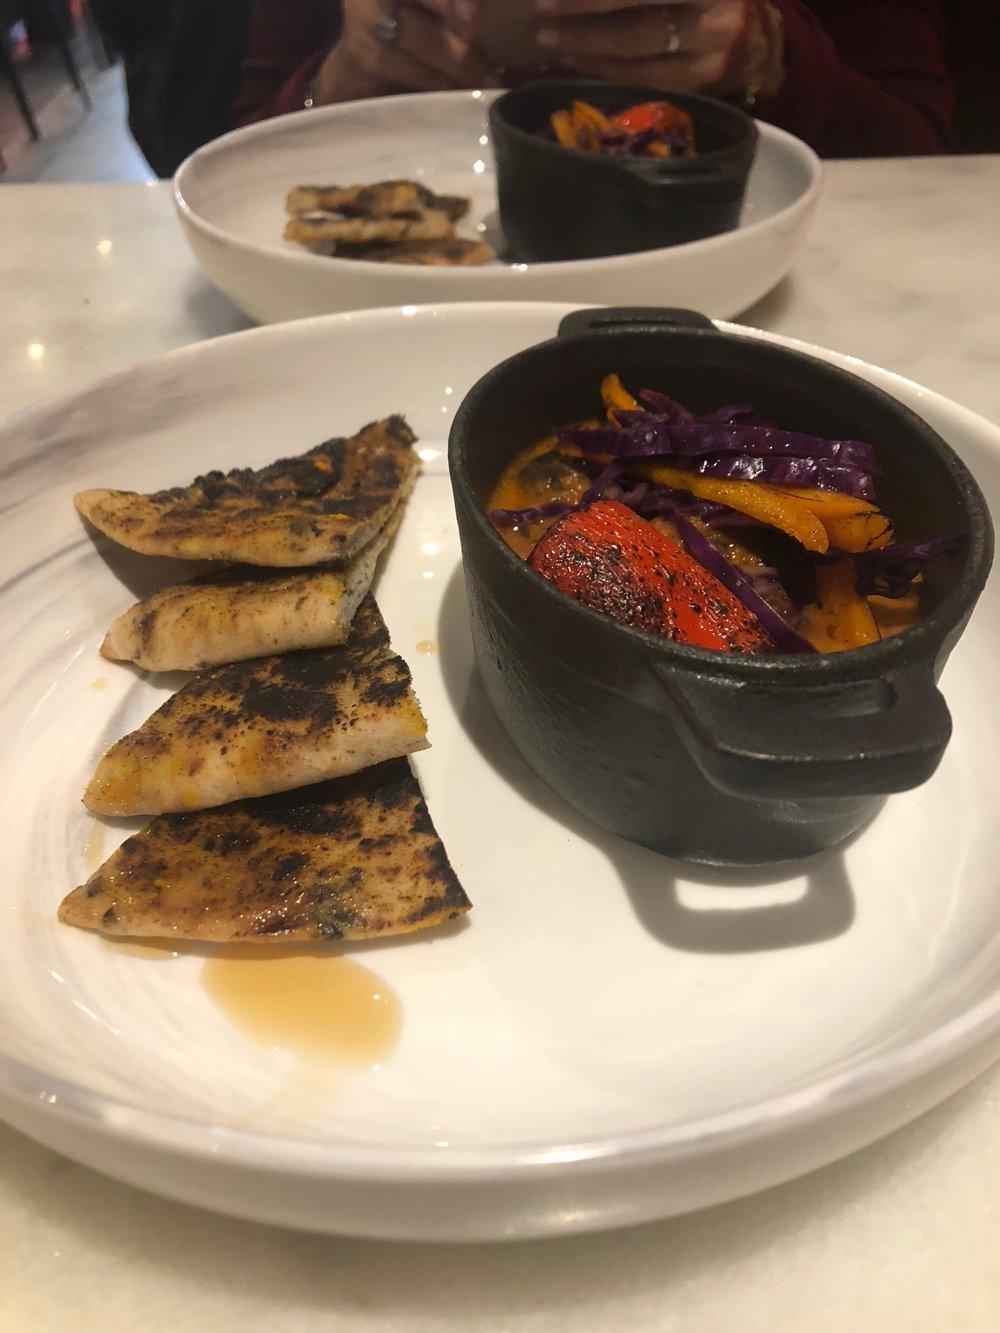 Calamari and Roasted Vegetables